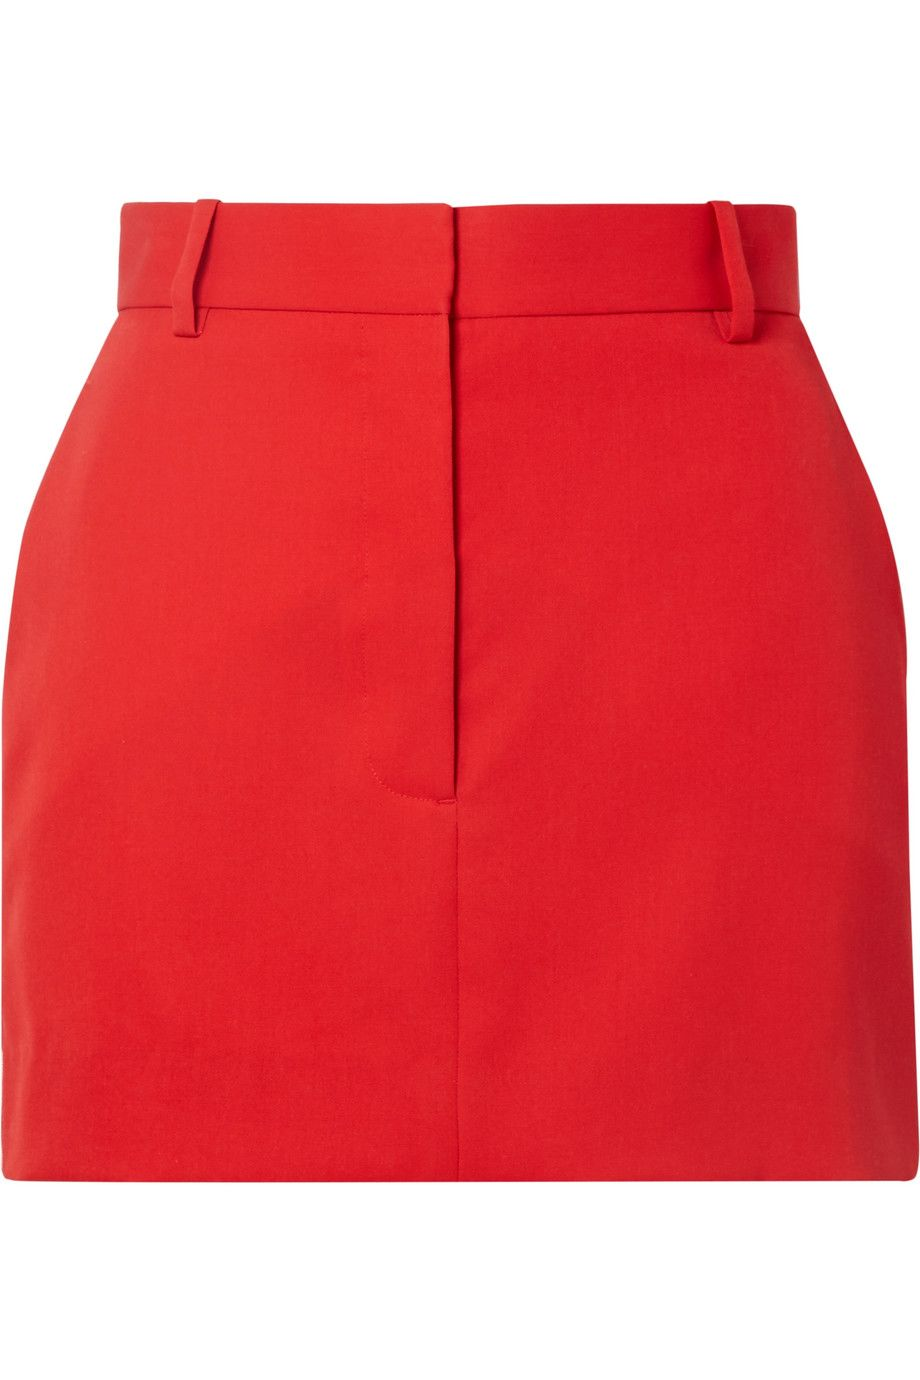 #PopbelaOOTD: Berburu Fashion Item Warna Merah untuk OOTD yang Bold